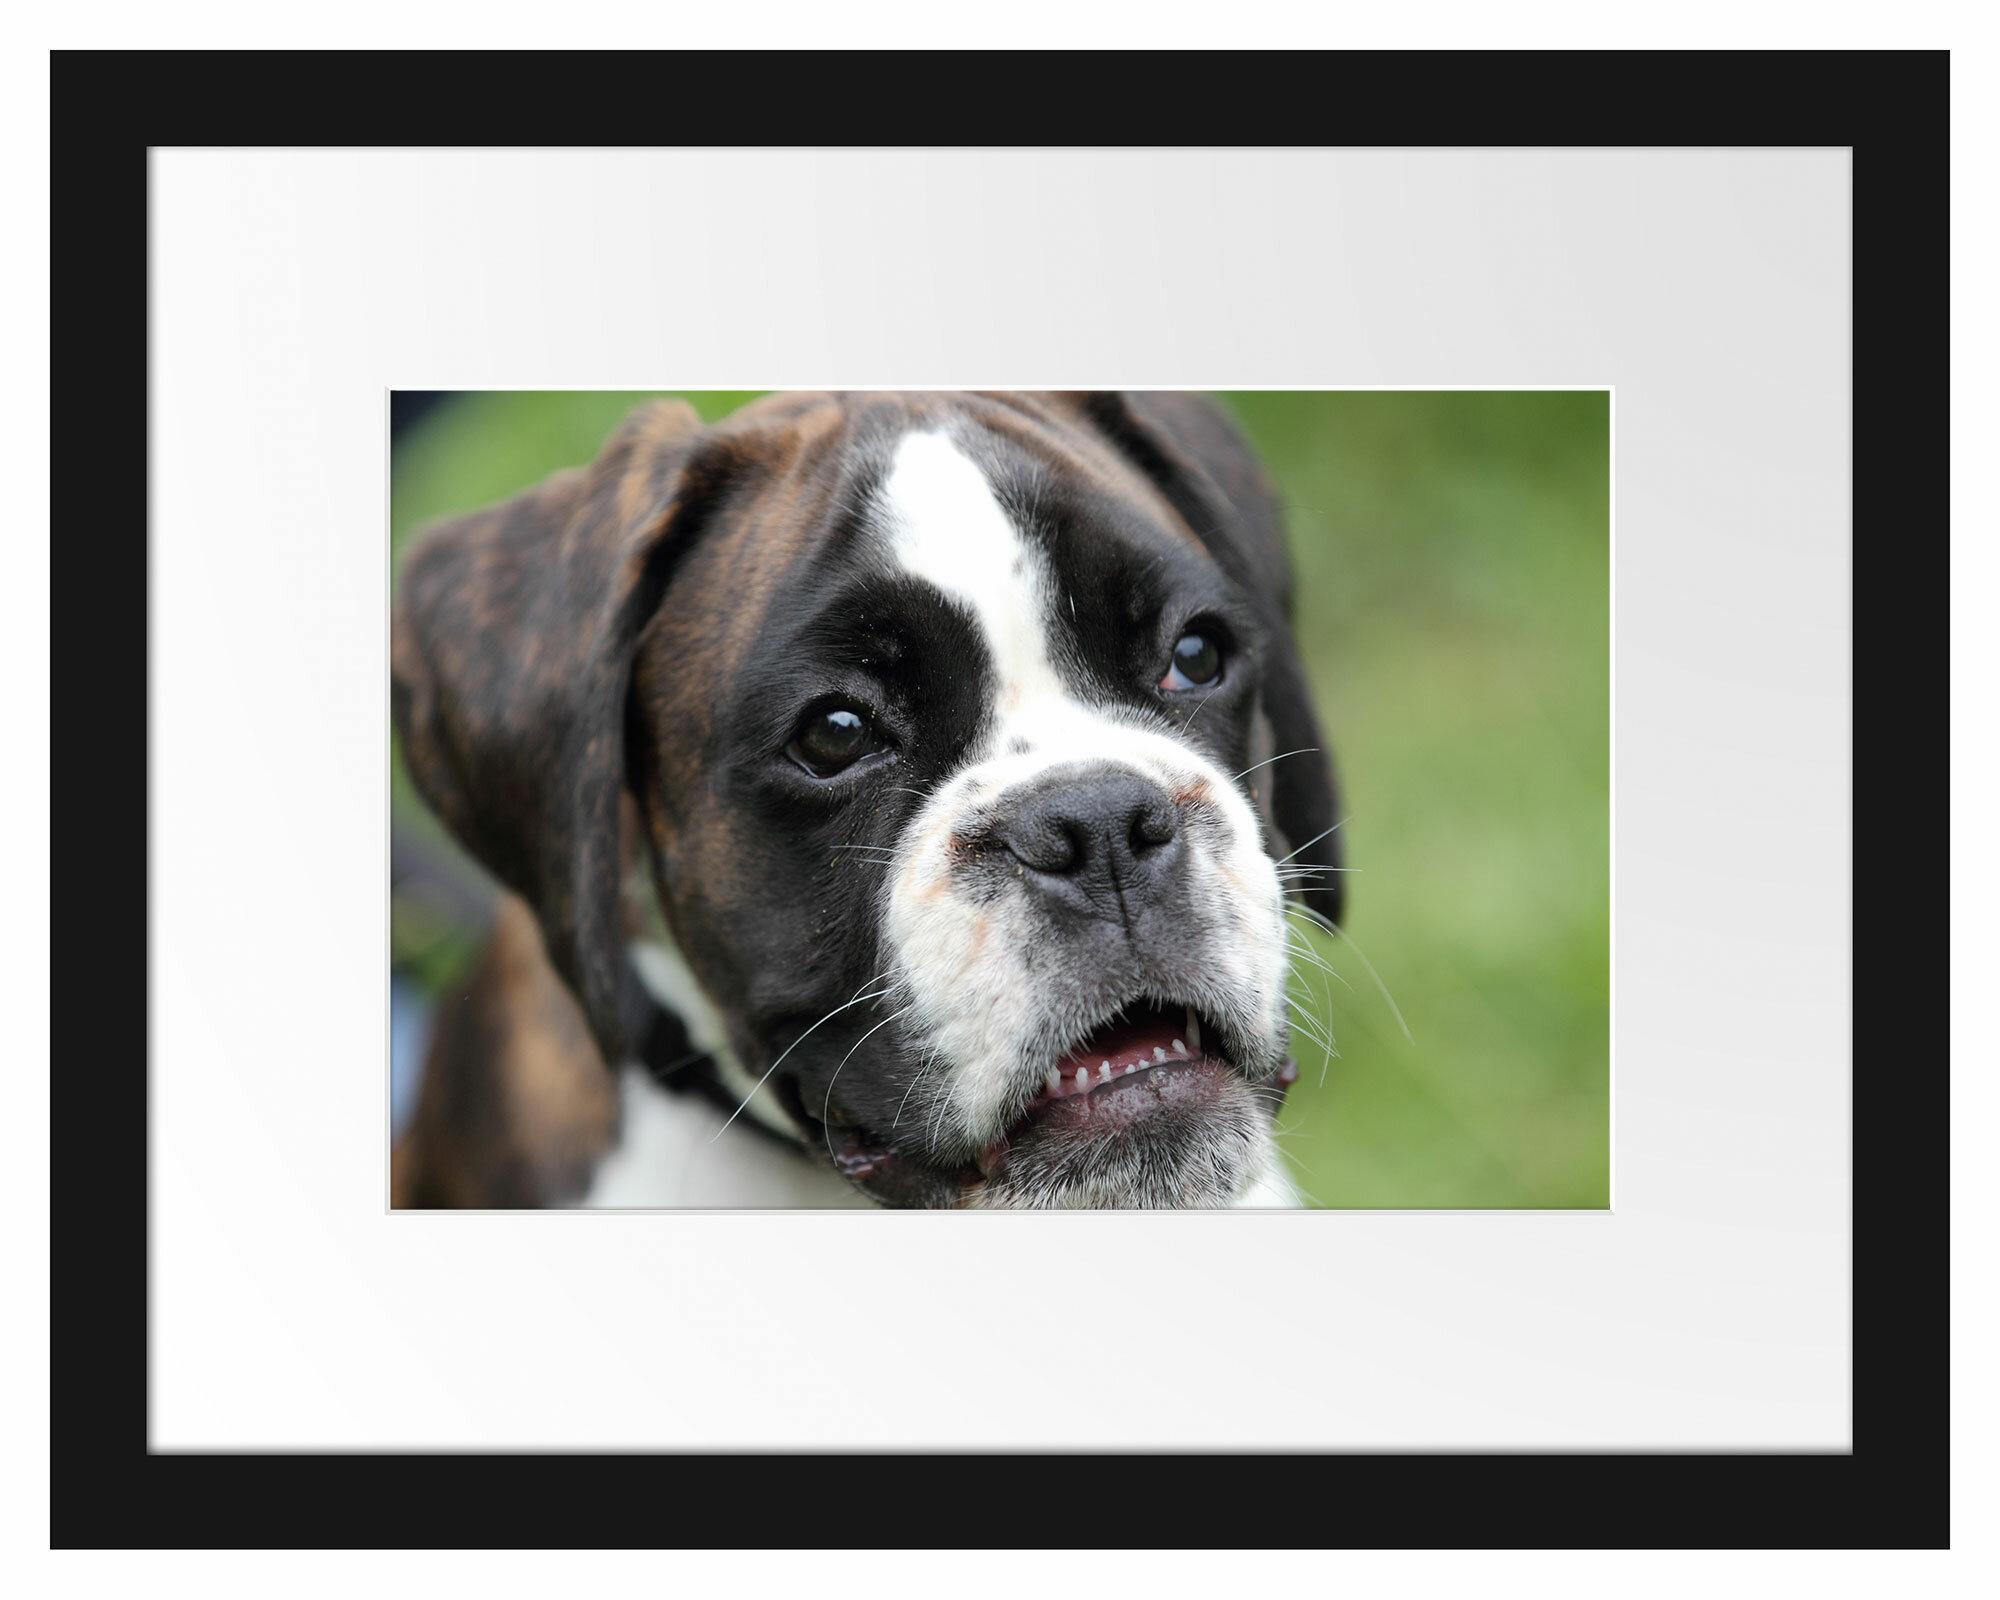 East Urban Home German Boxer Puppy Framed Art Print Poster Wayfair Co Uk